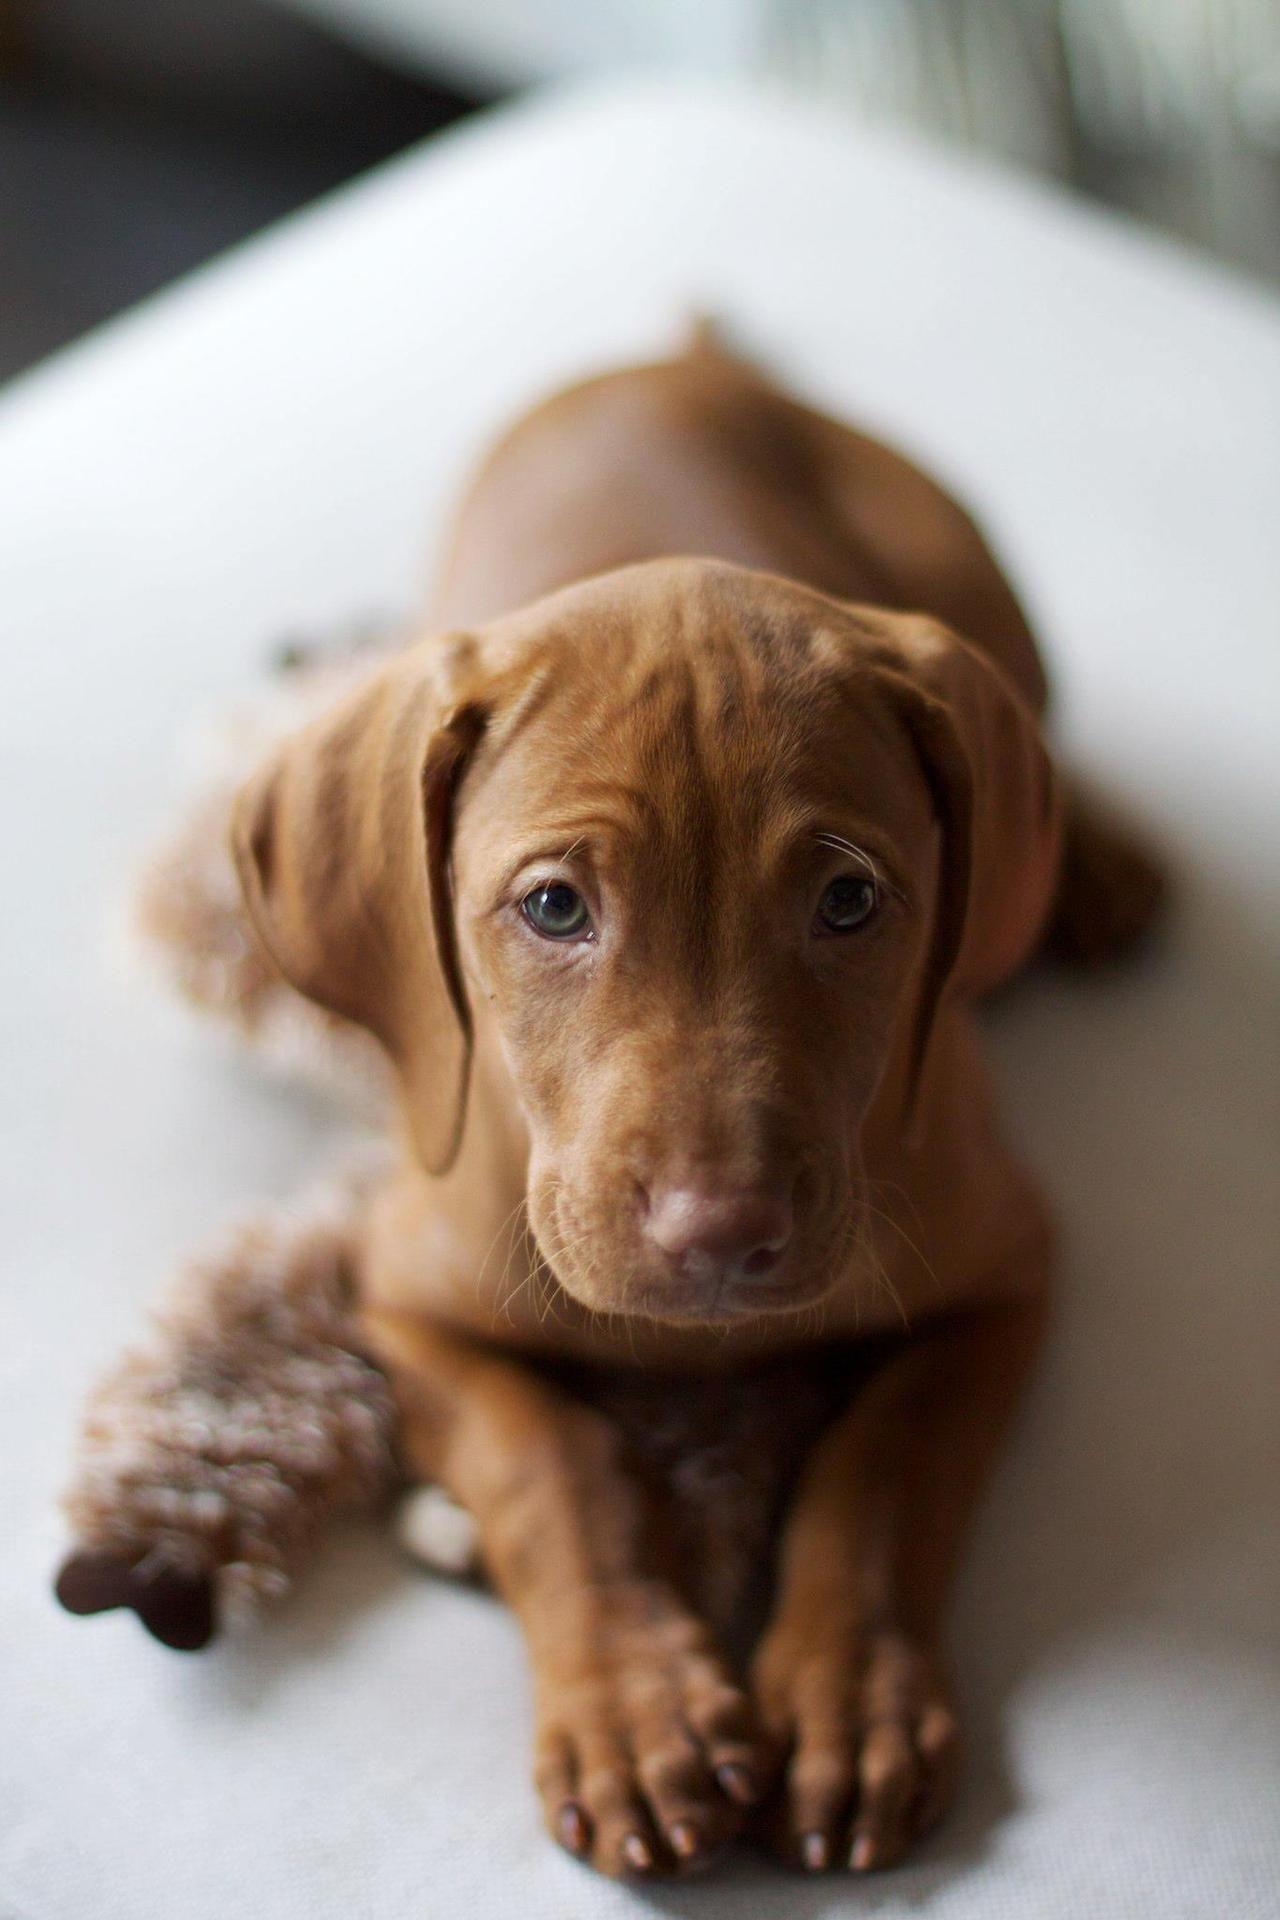 Baby vizsla uc animal love pinterest animal dog and pup